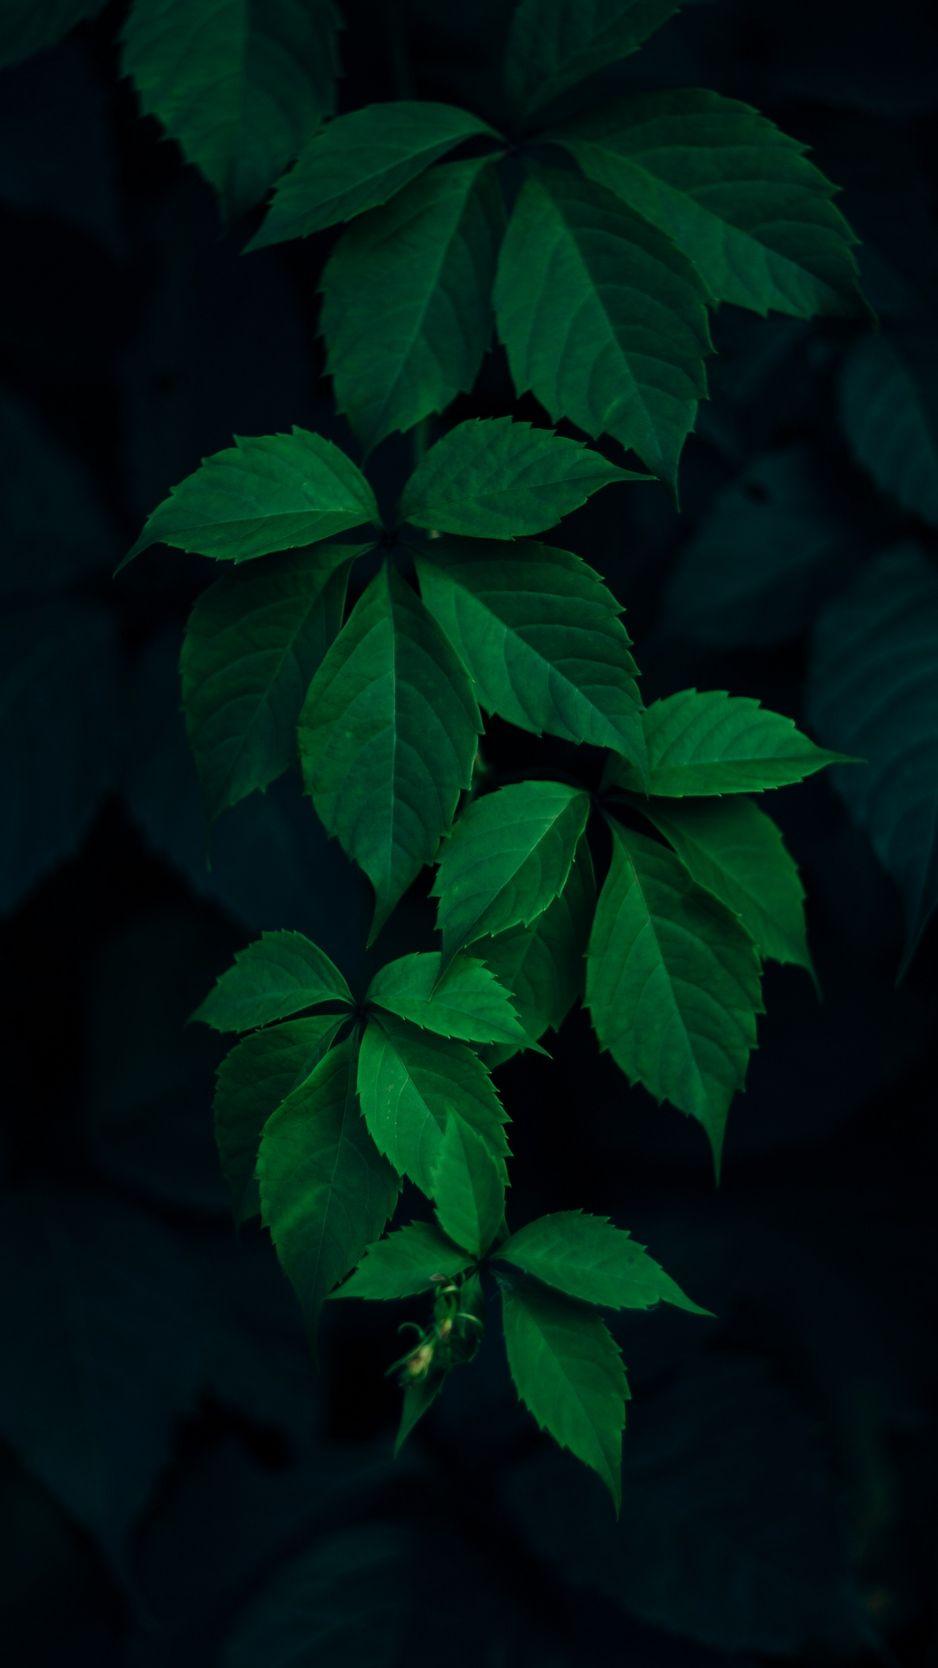 938x1668 Wallpaper Leaves Green Branches Dark Background Fotografi Alam Fotografi Seni Latar Belakang